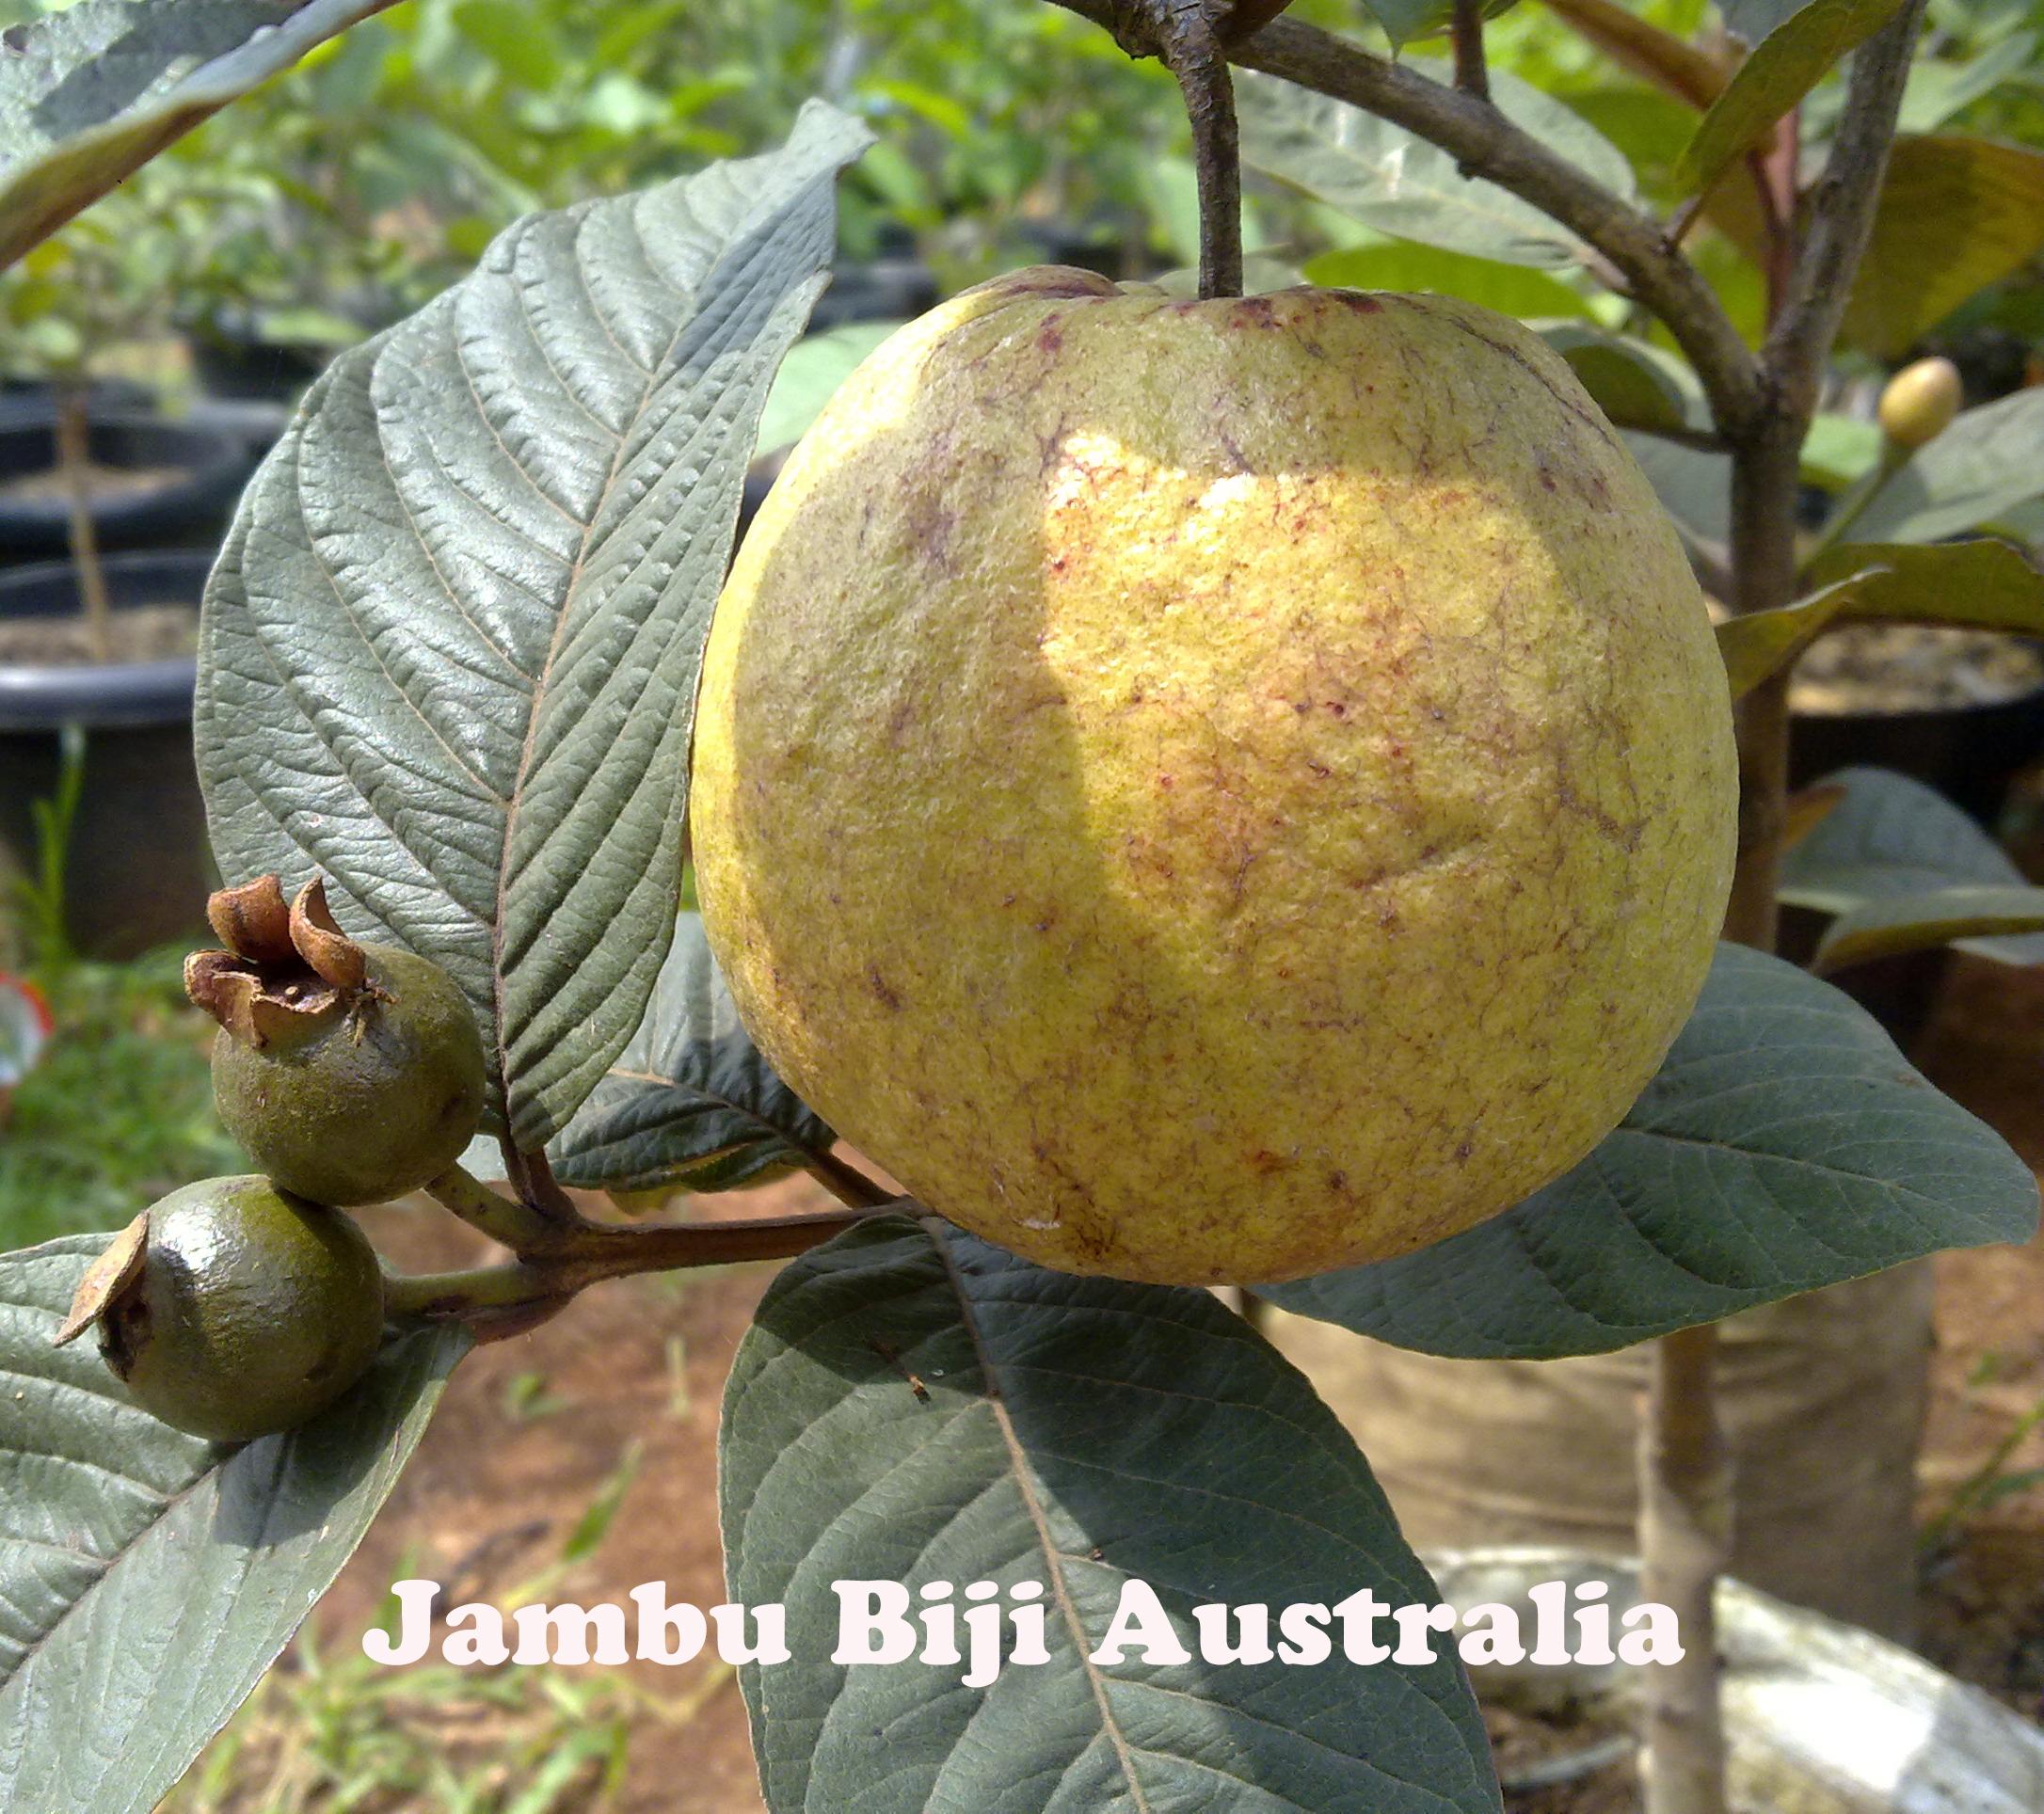 buah jambu biji australia